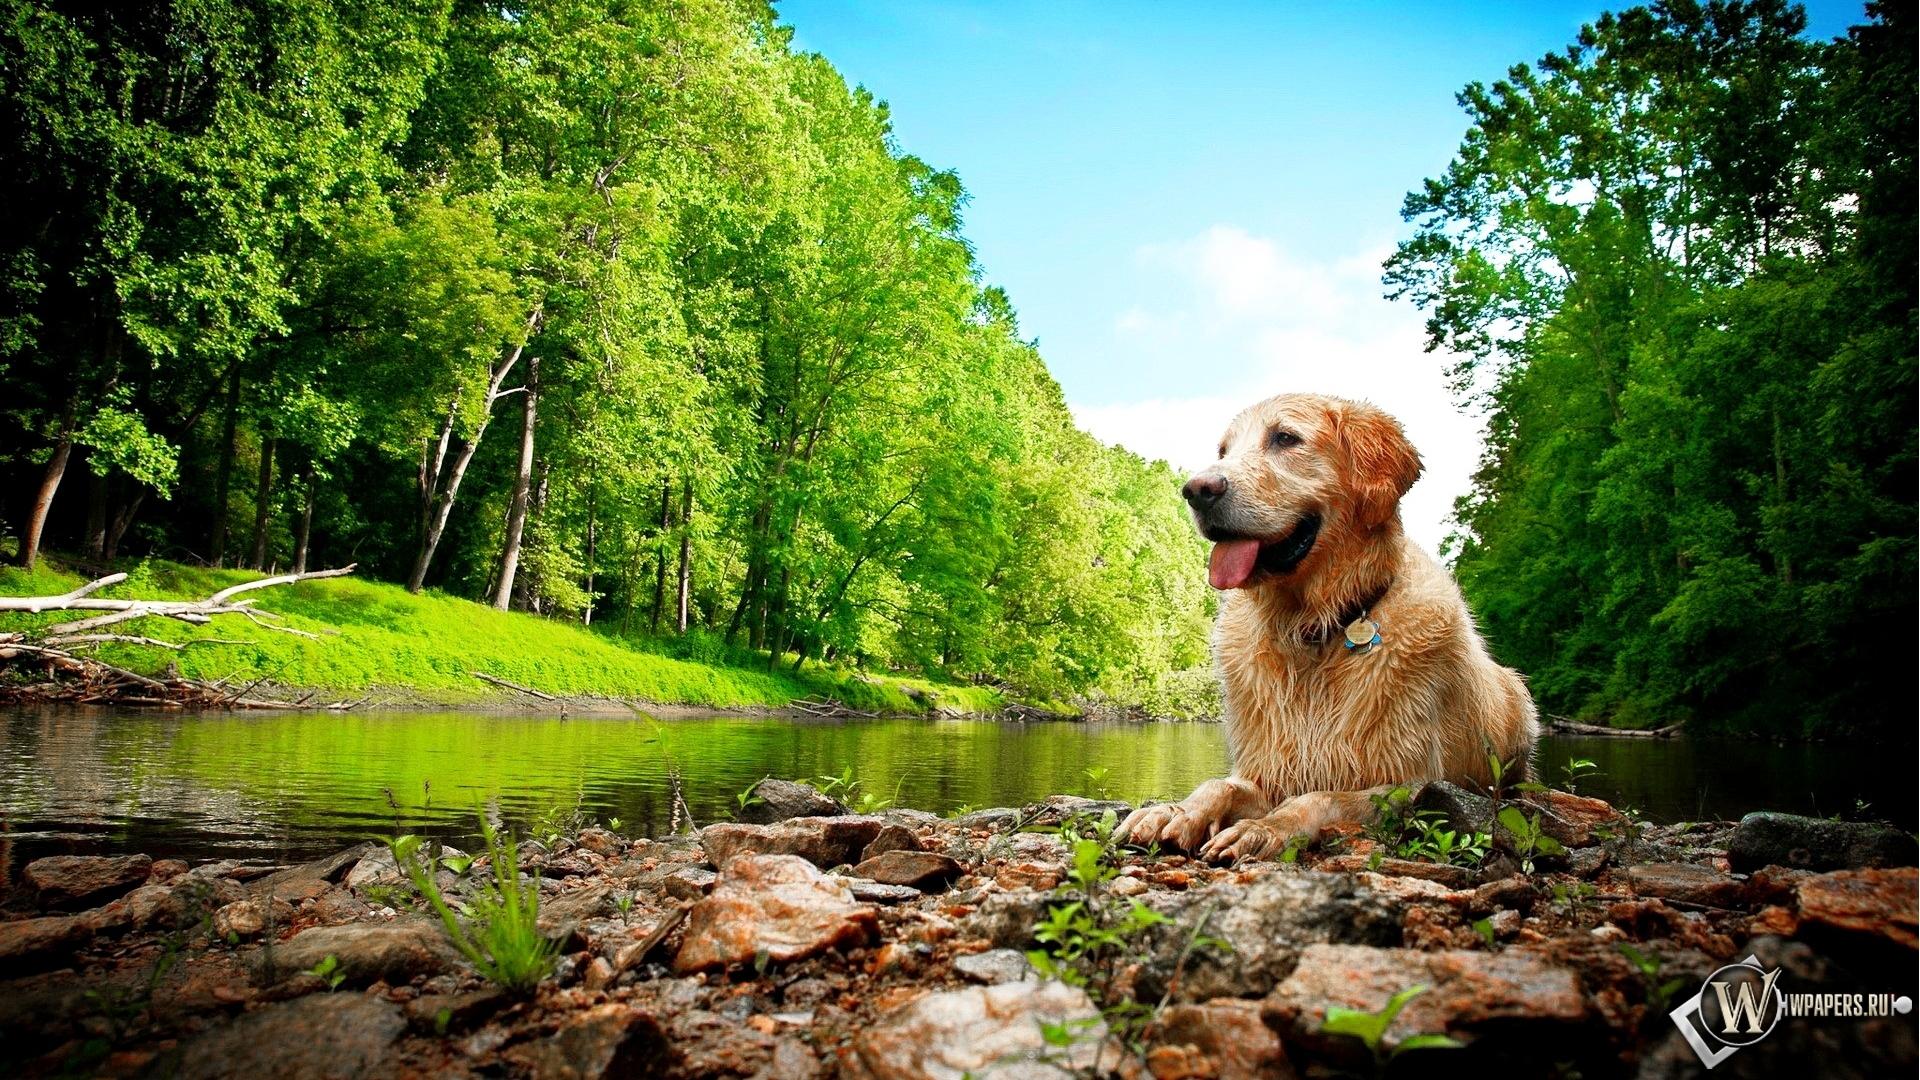 Природа красота собака 1920x1080